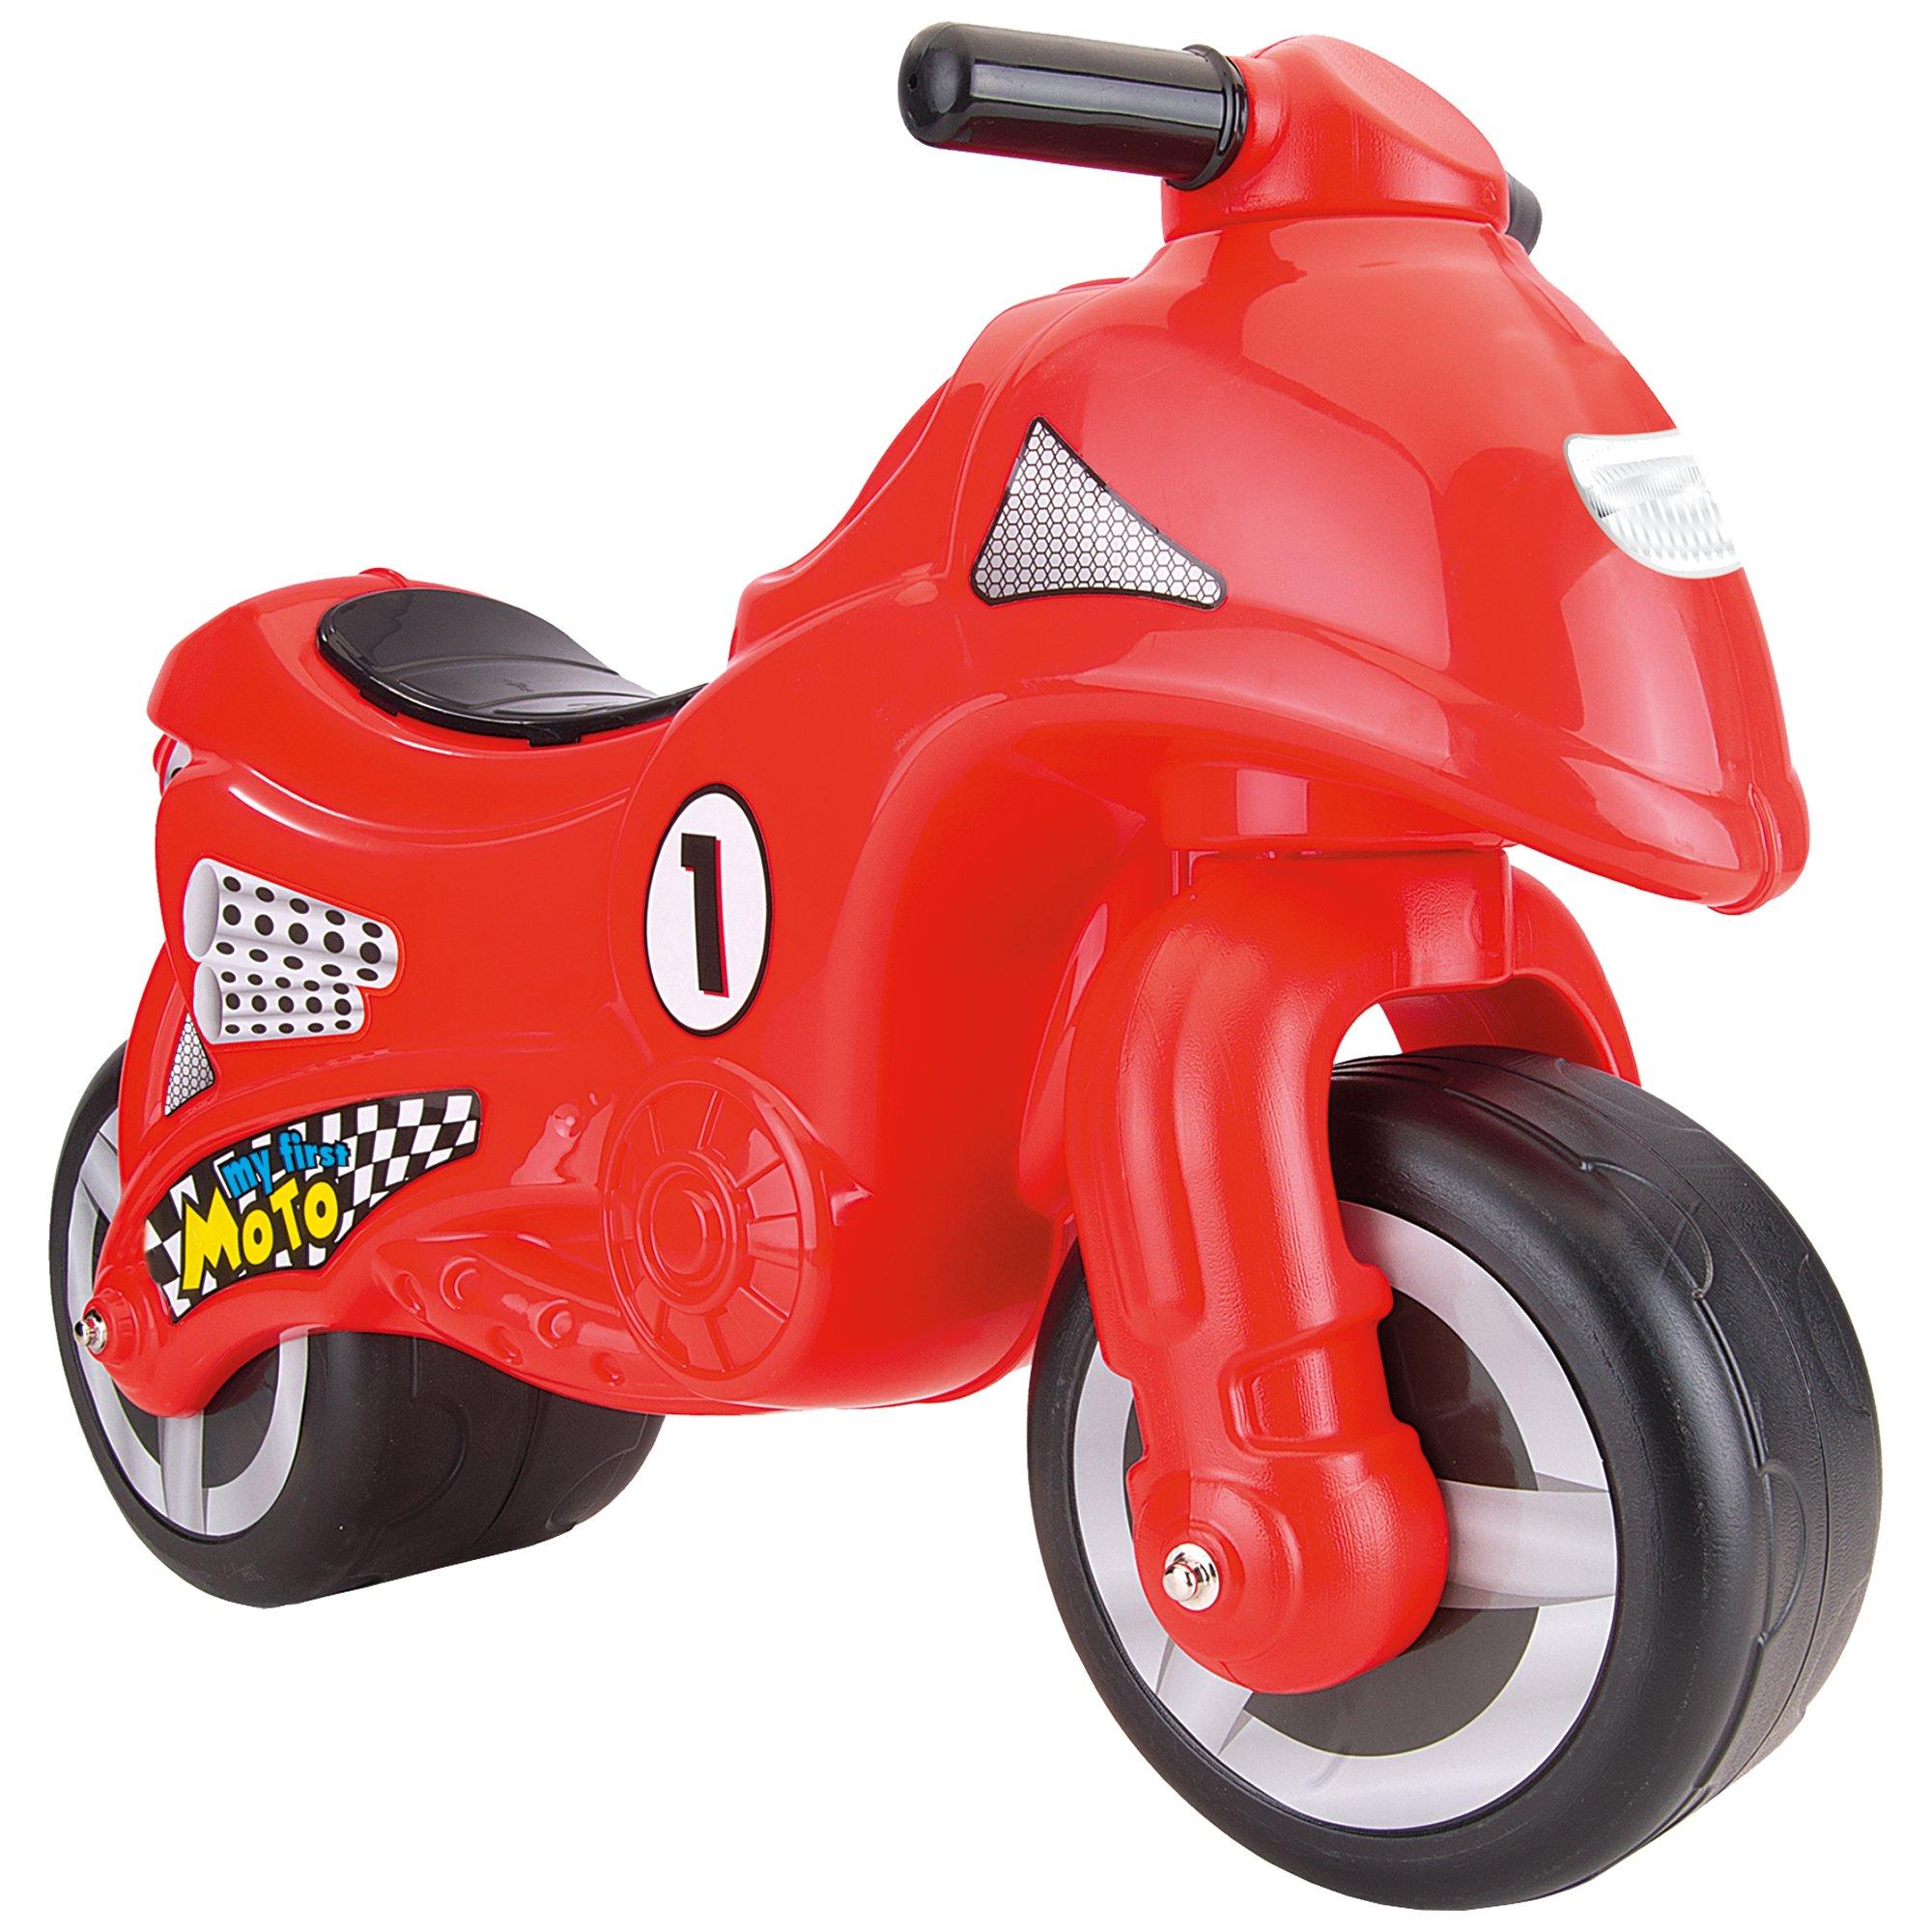 Motocicleta fara pedale Dolu My First Moto